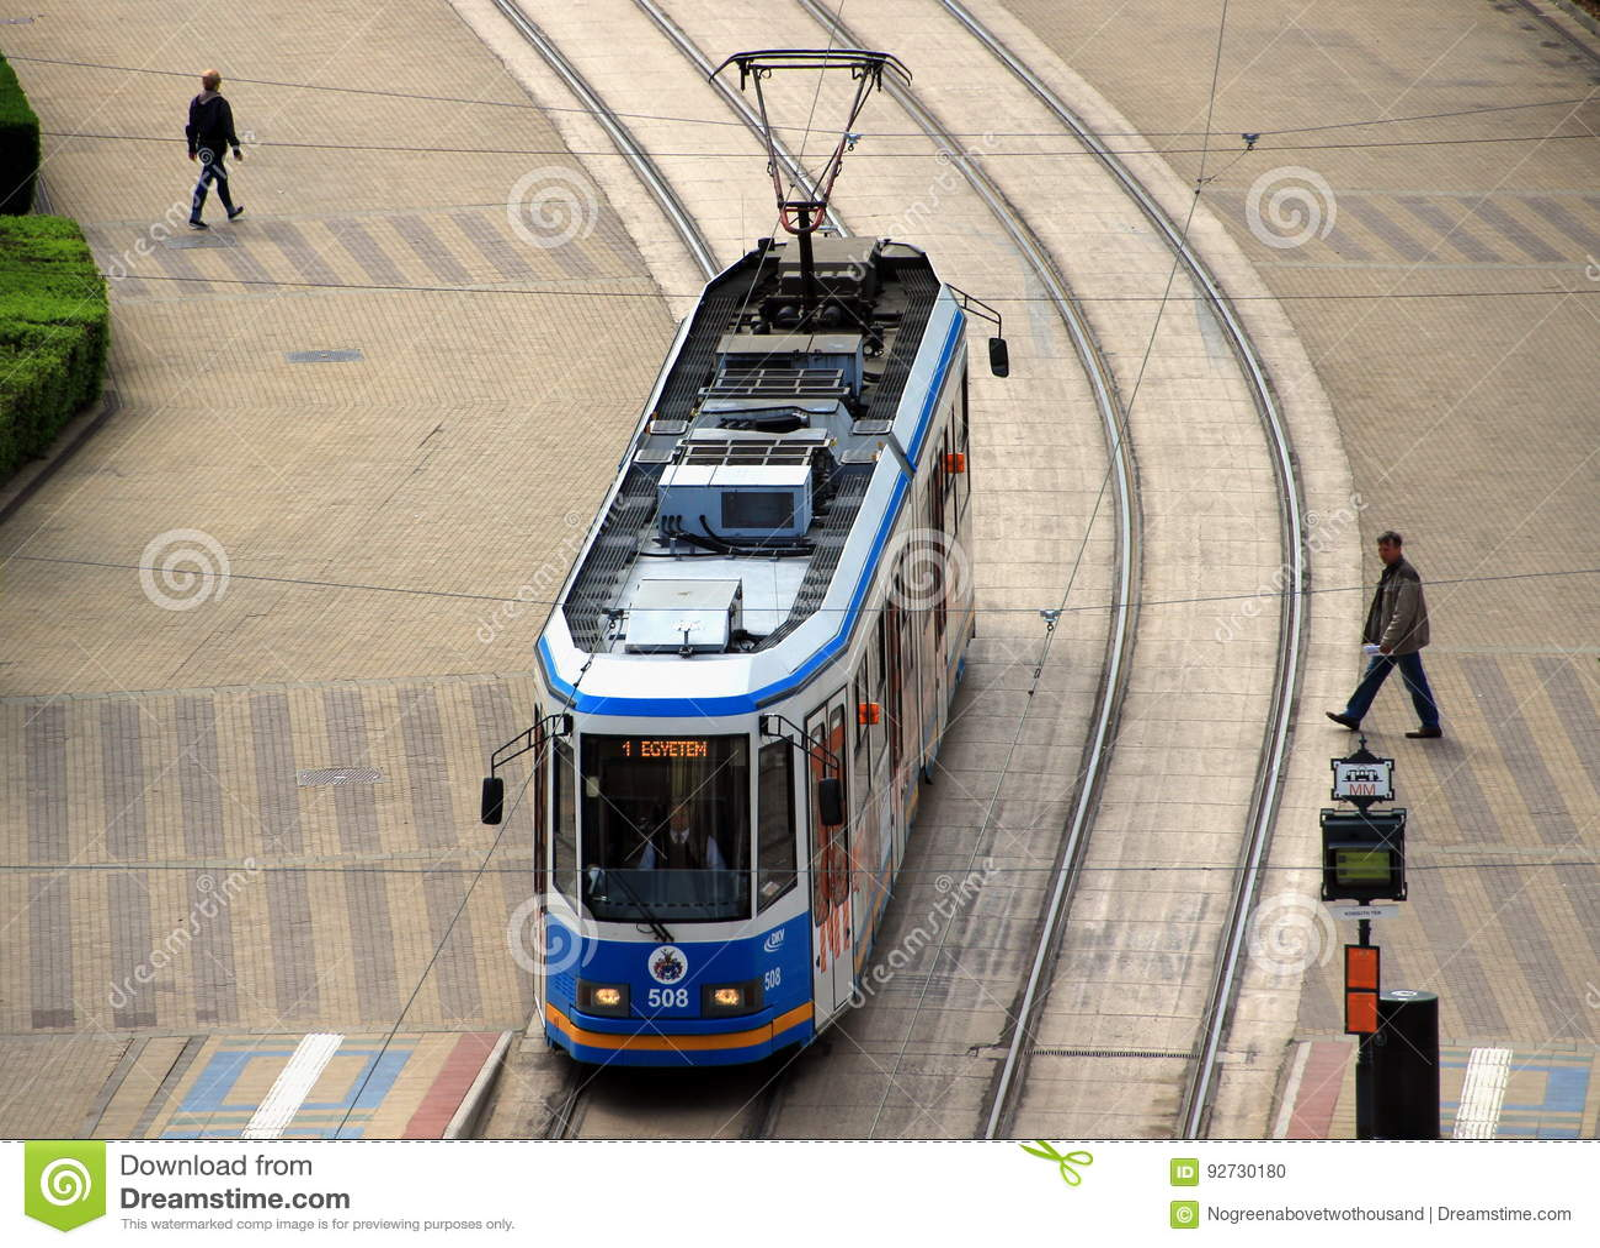 Modern Ganz tram in Debrecen, Hungary